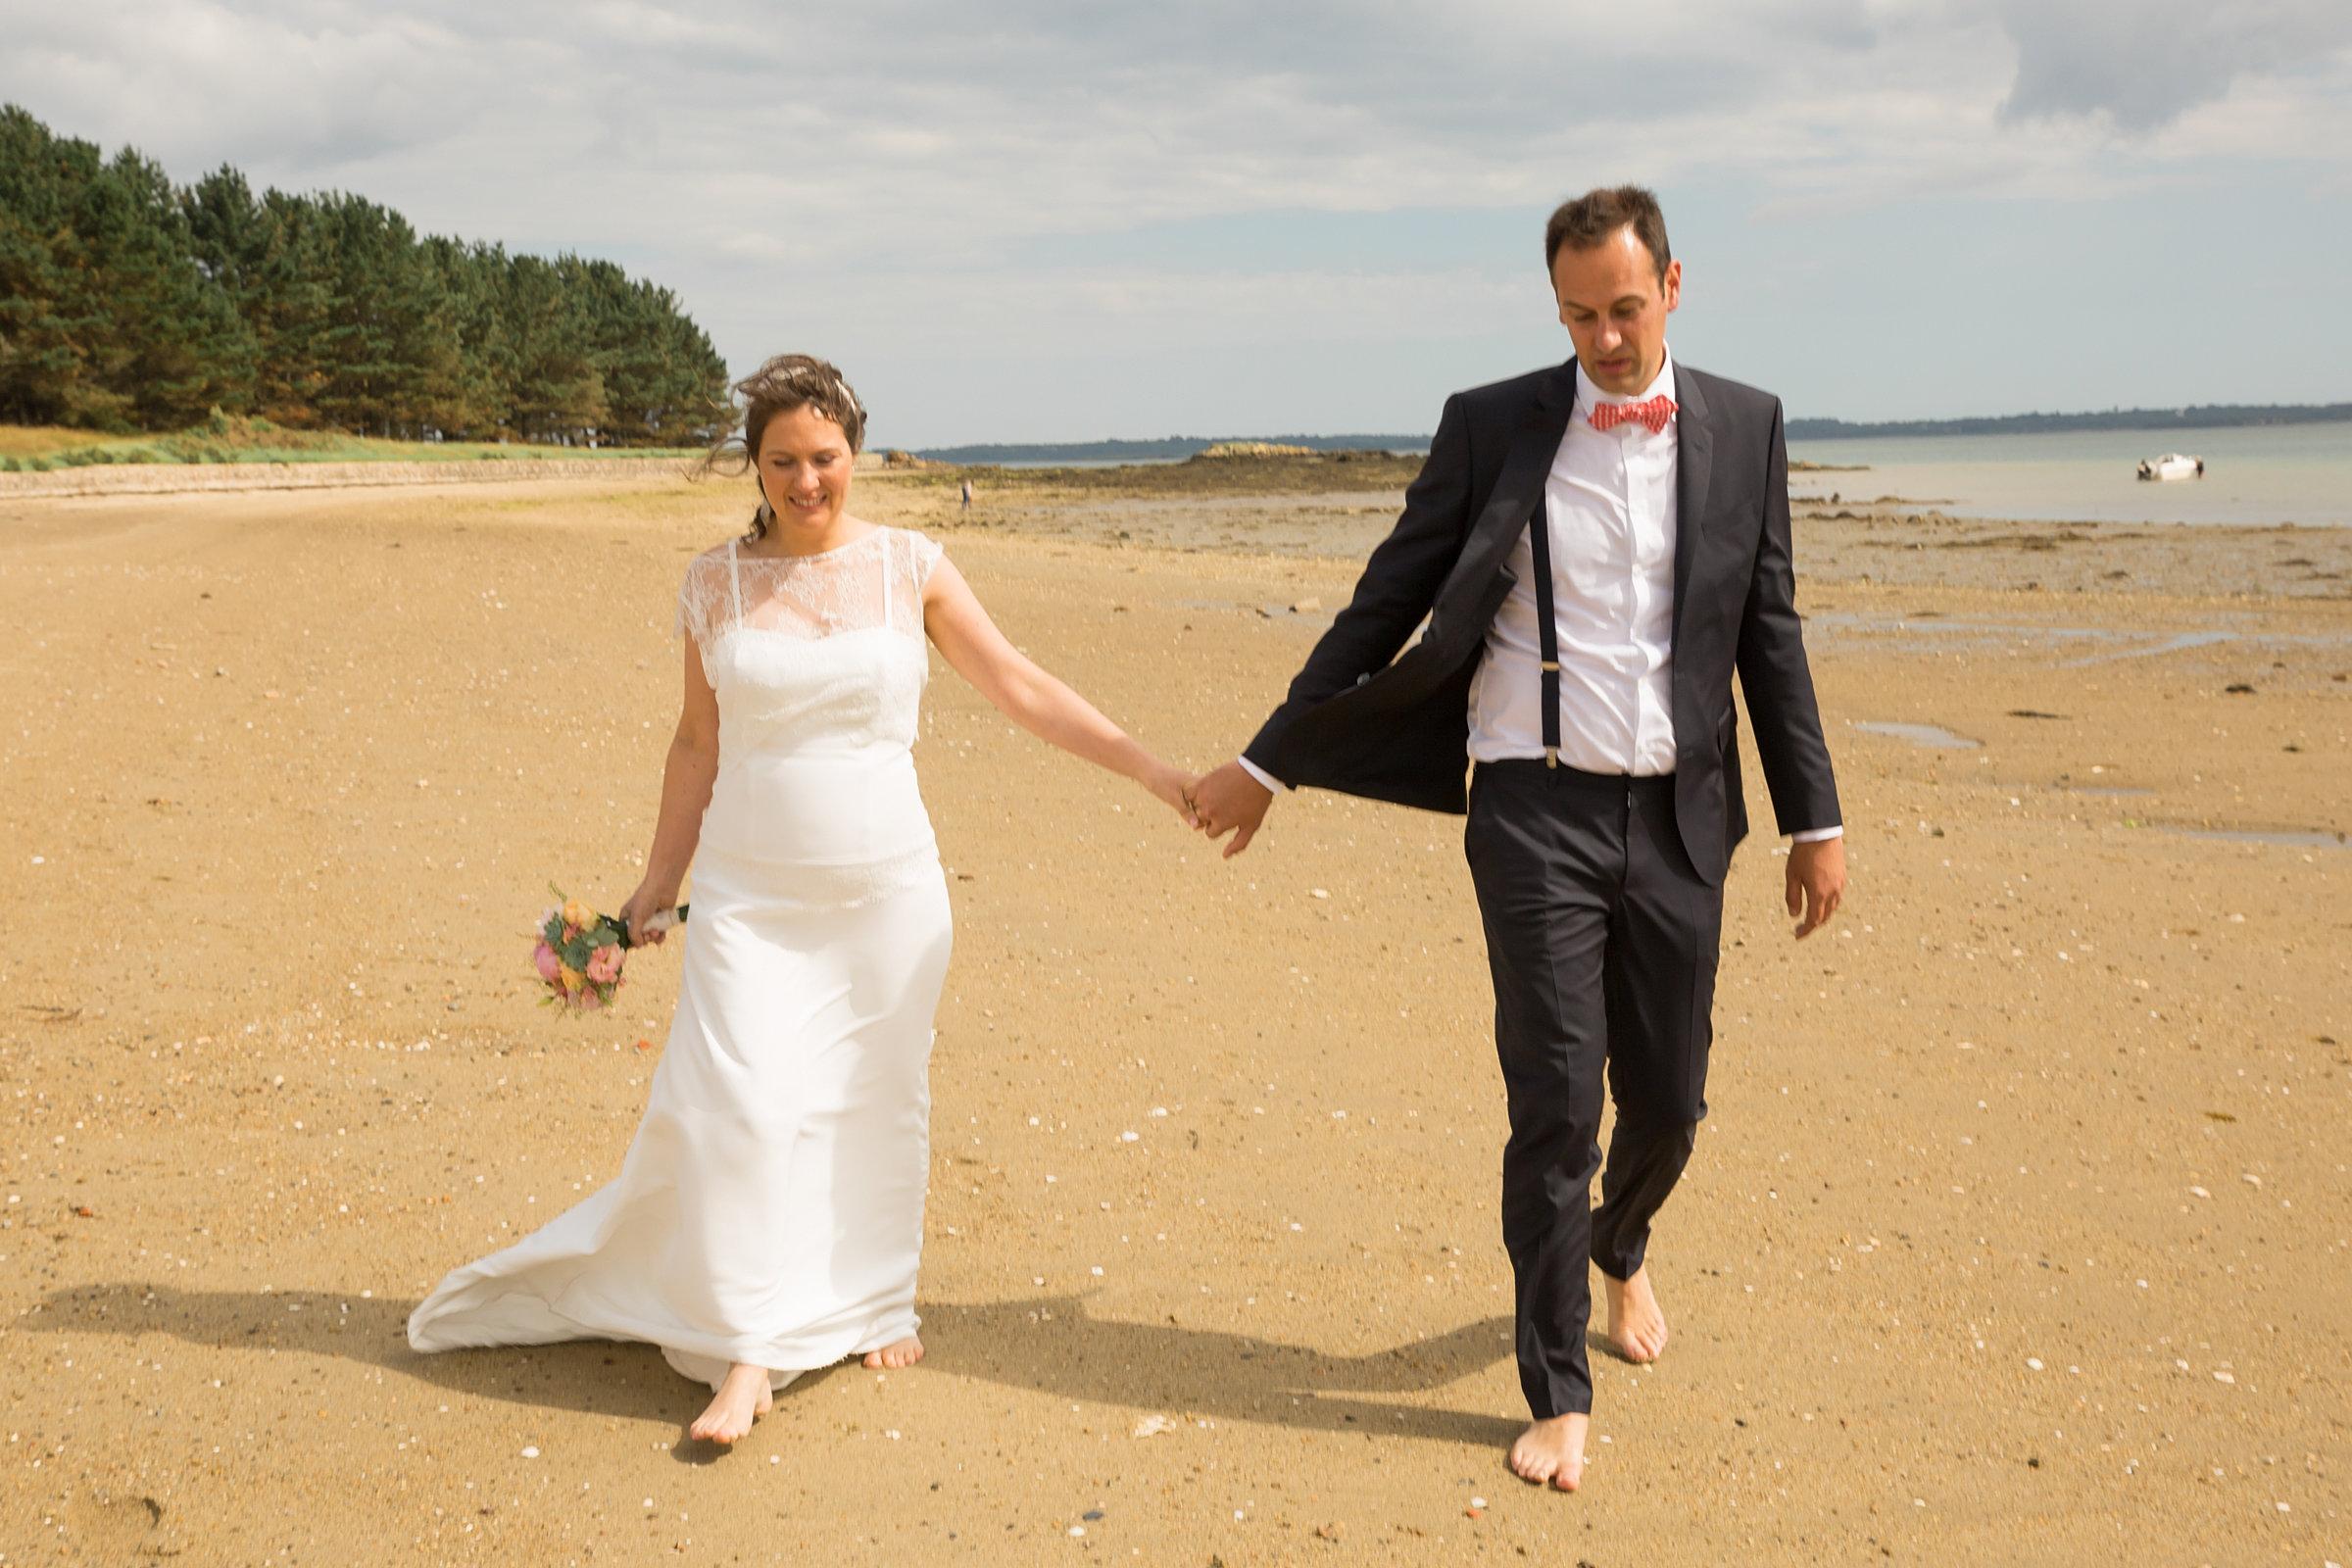 photographe mariage vannes morbihan bretagne photographe mariage vannes lv - Photographe Mariage Vannes